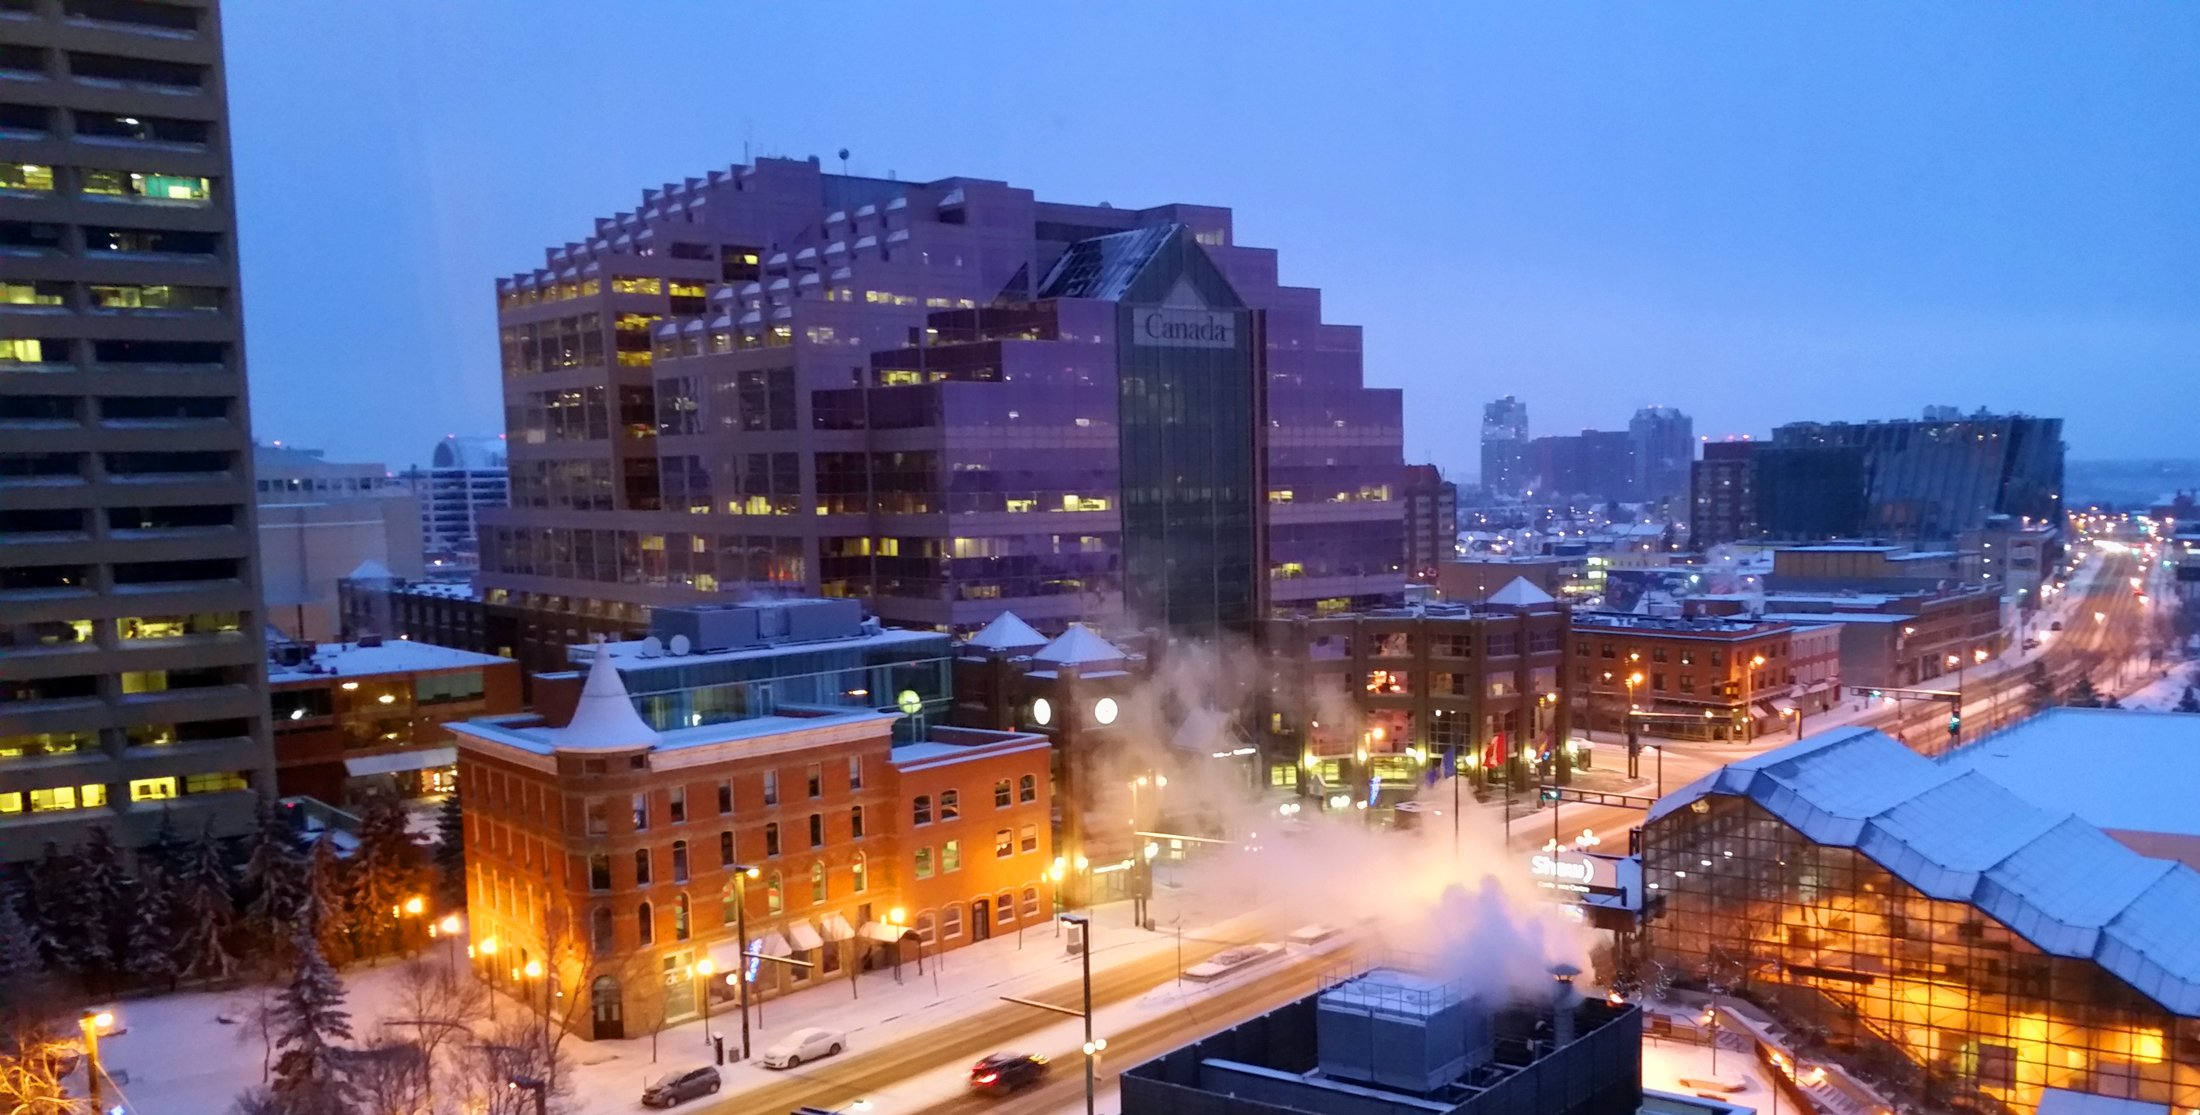 edmonton-winter-city-lights